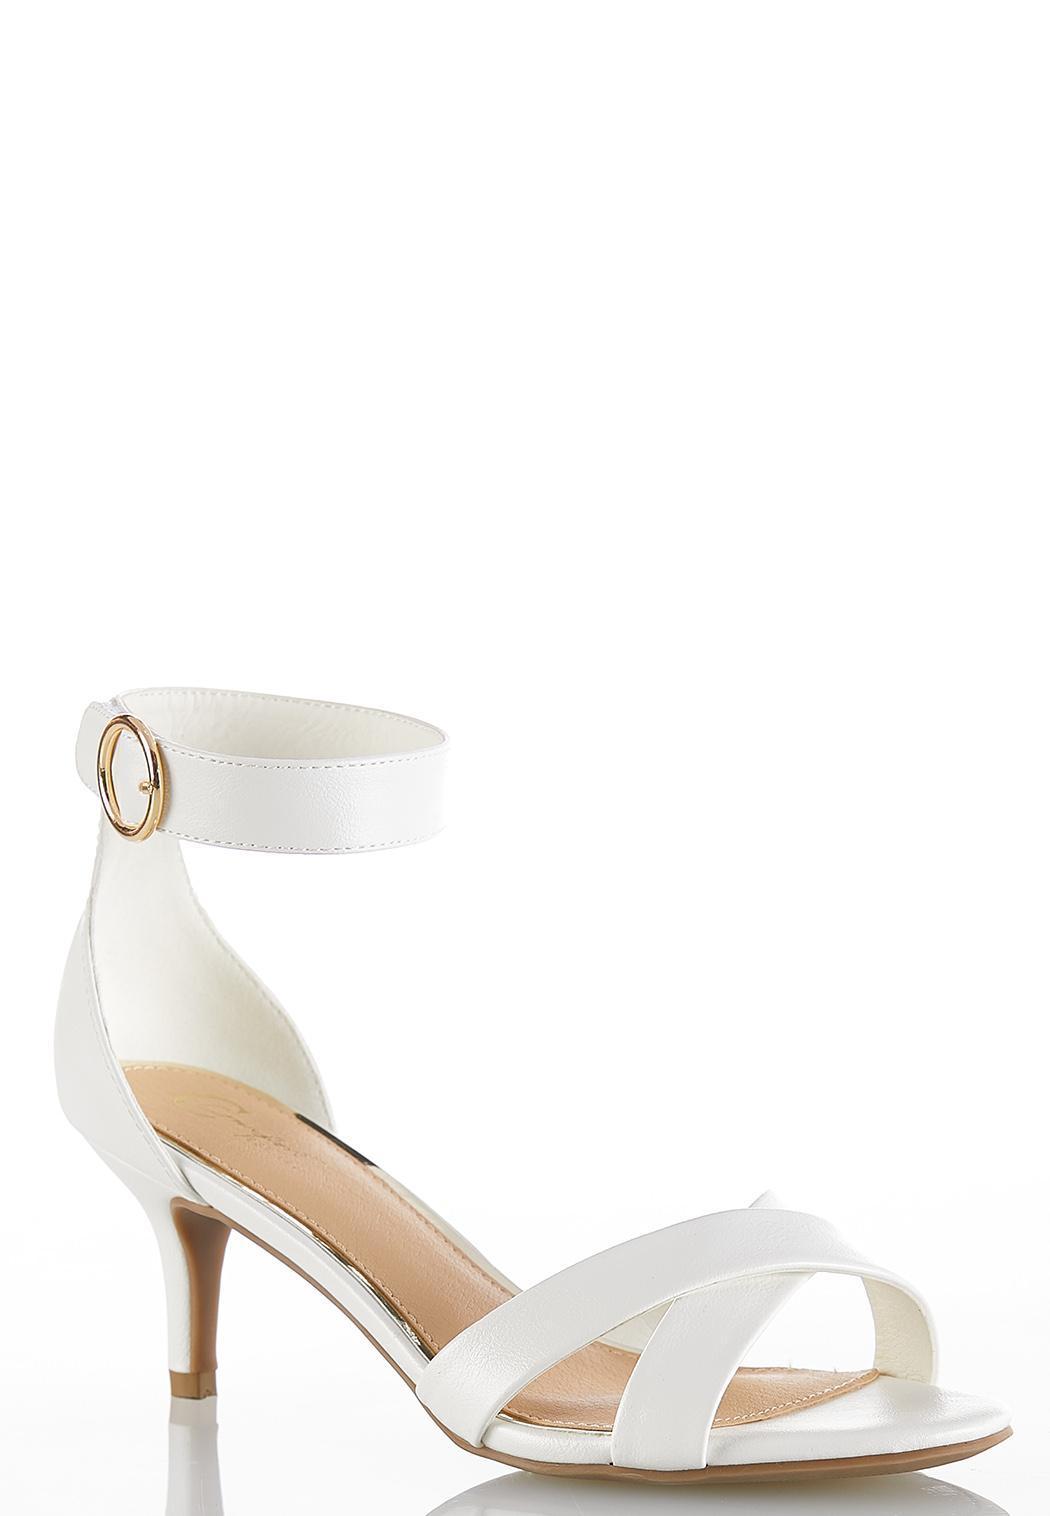 fce54f692 Ankle Strap Heeled Sandals alternate view · Ankle Strap Heeled Sandals